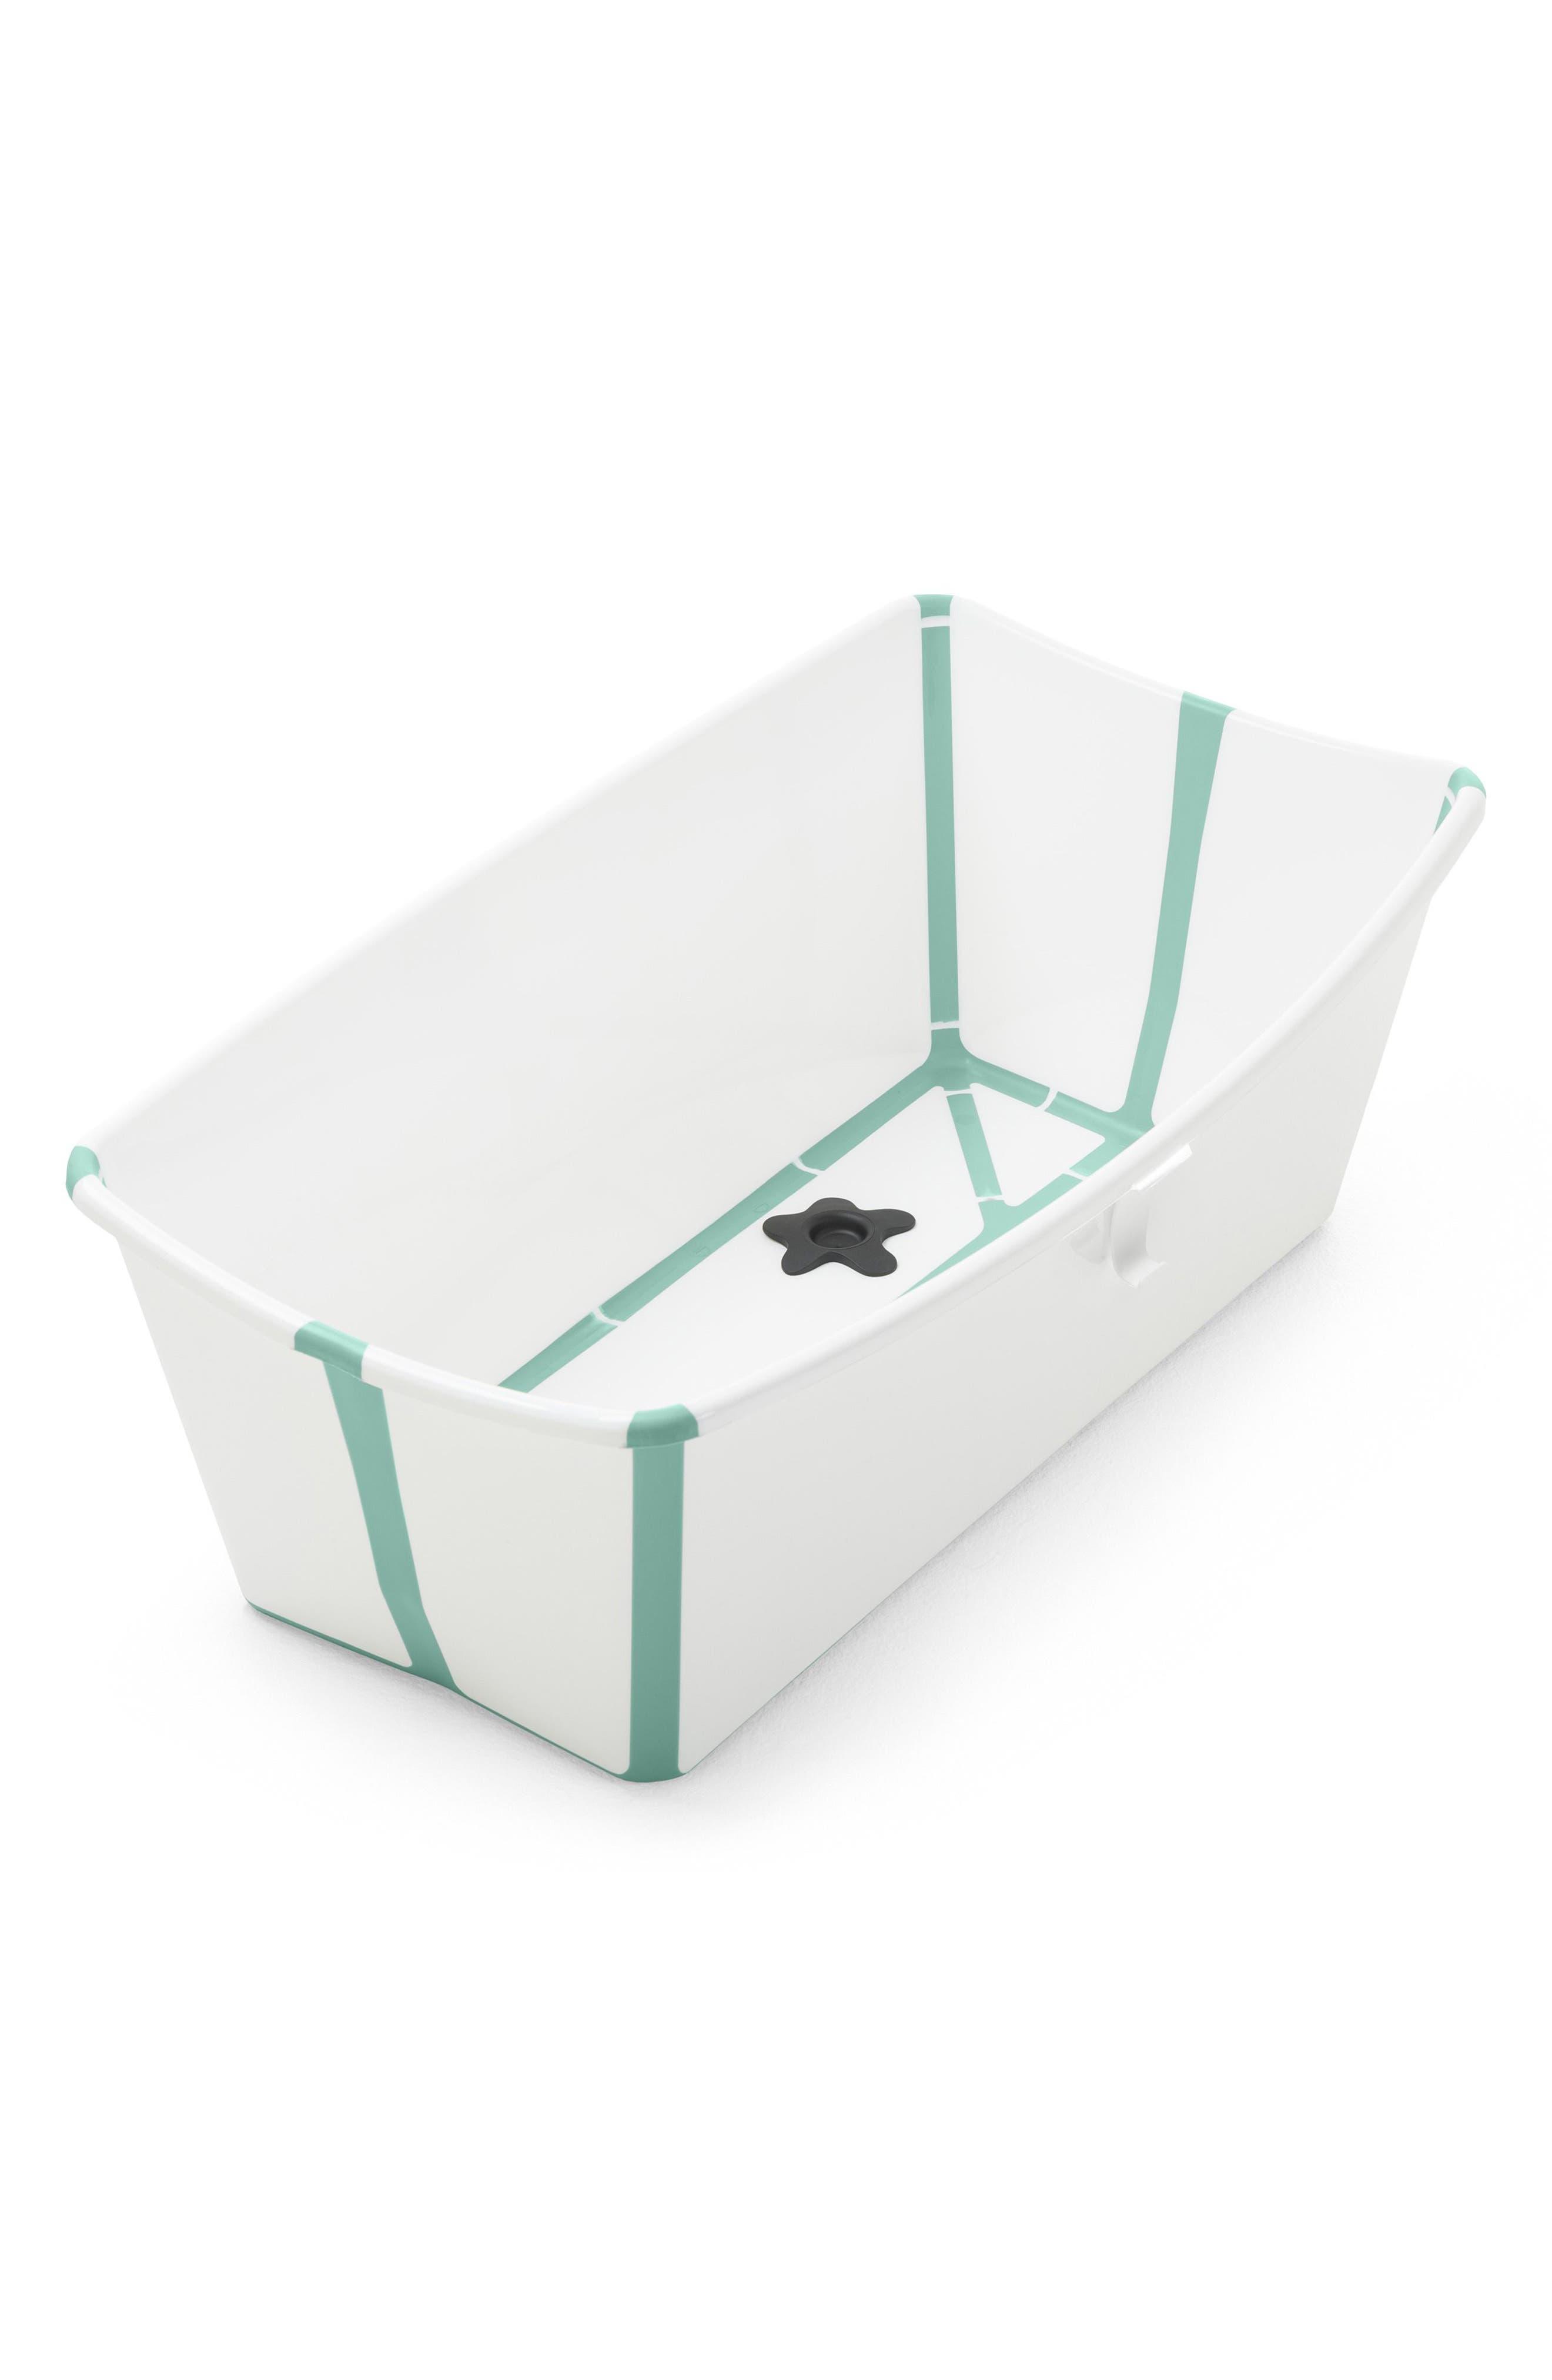 Stokke 'Flexi Bath®' Foldable Baby Bathtub